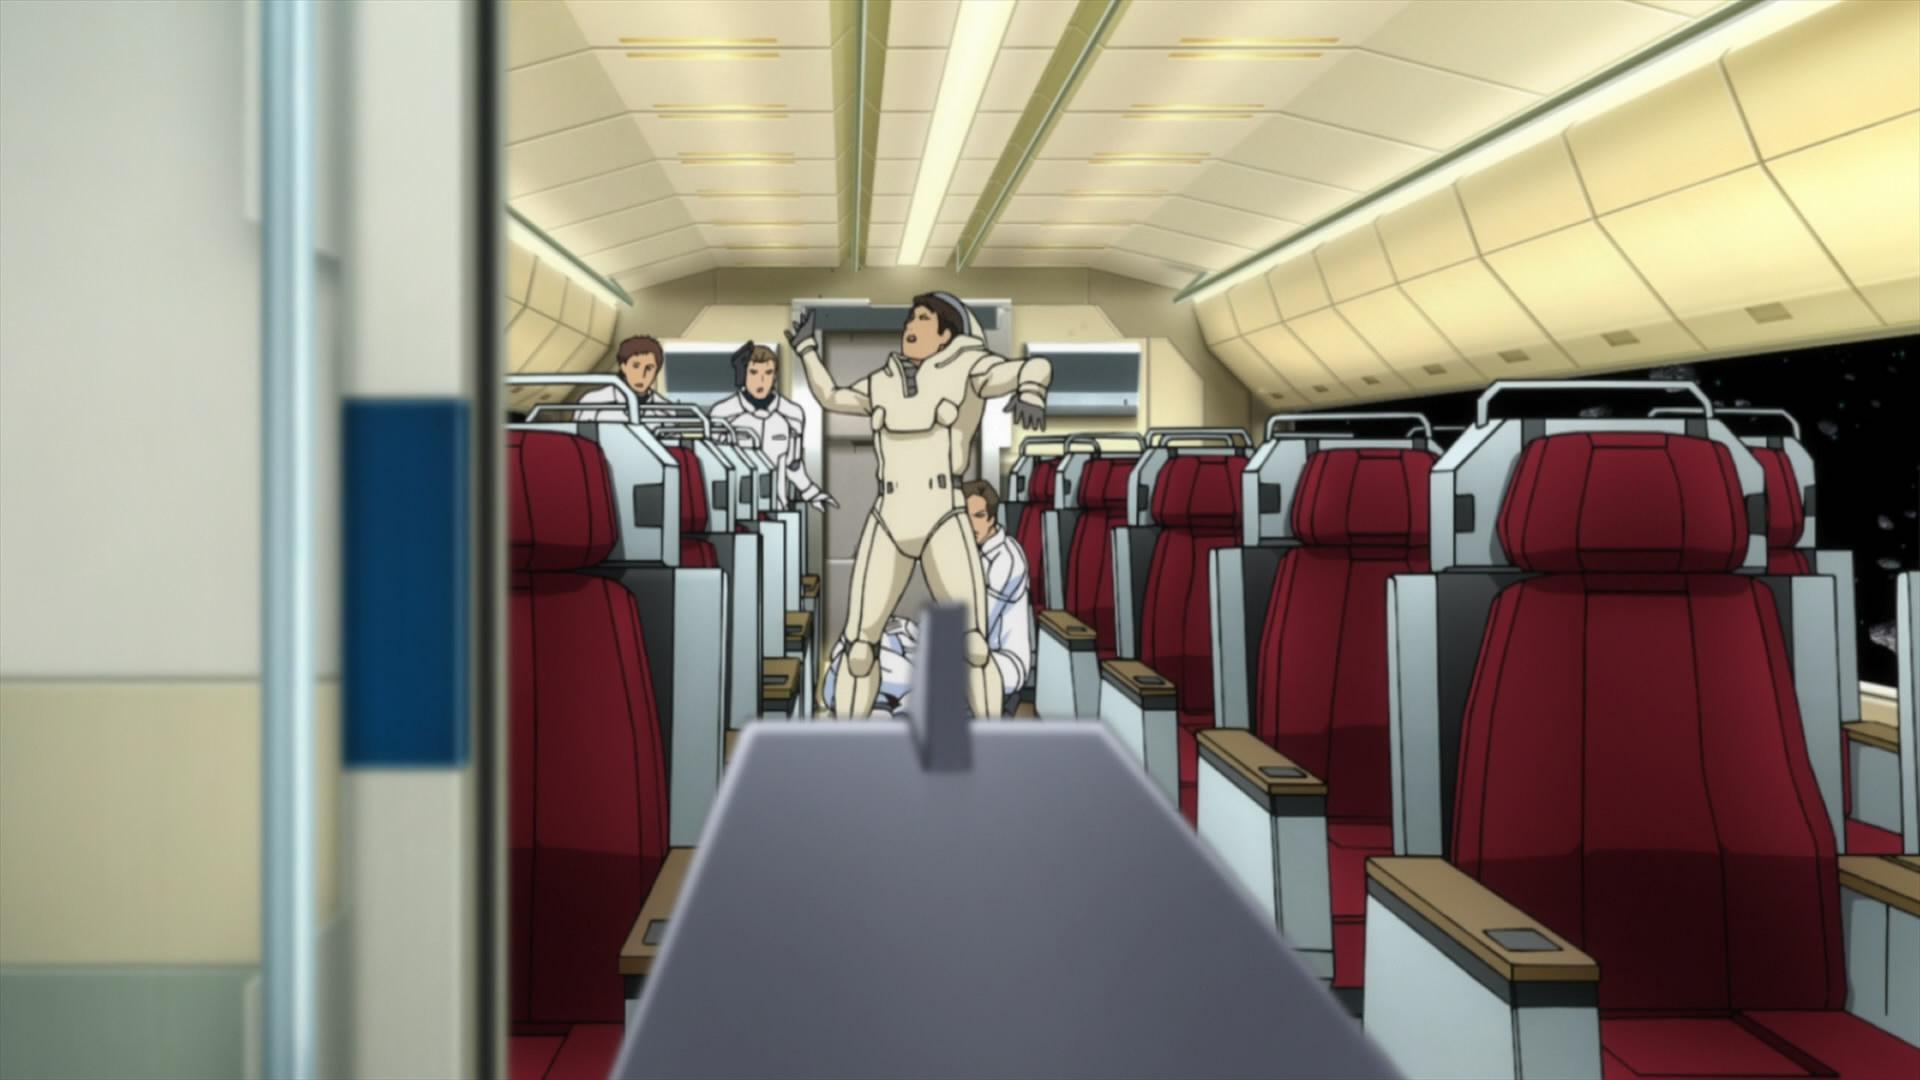 [gSS]_Mobile_Suit_Gundam_00_-_A_wakening_of_the_Trailblazer_(1080p)_[2B252856].mkv_snapshot_00.13.34_[2011.01.07_04.08.49]